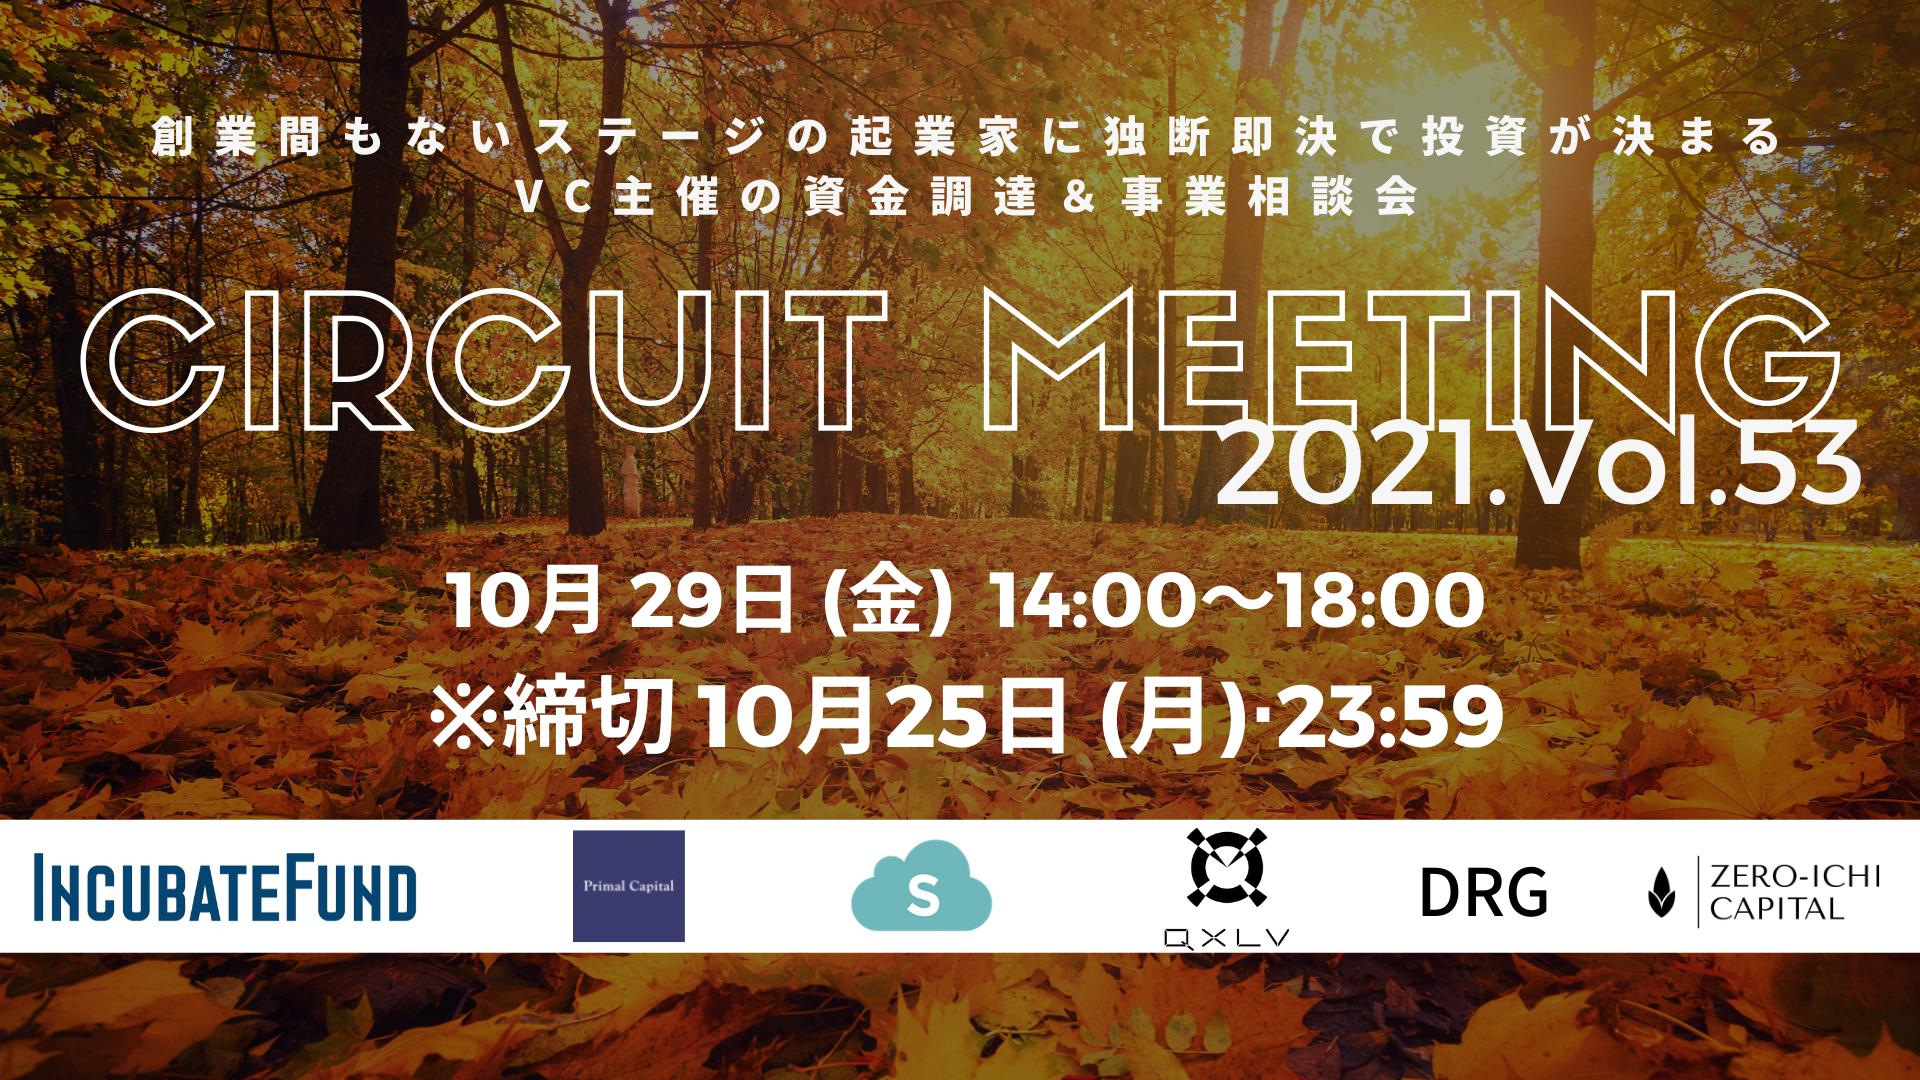 【10/25締切】Circuit Meeting Vol.53